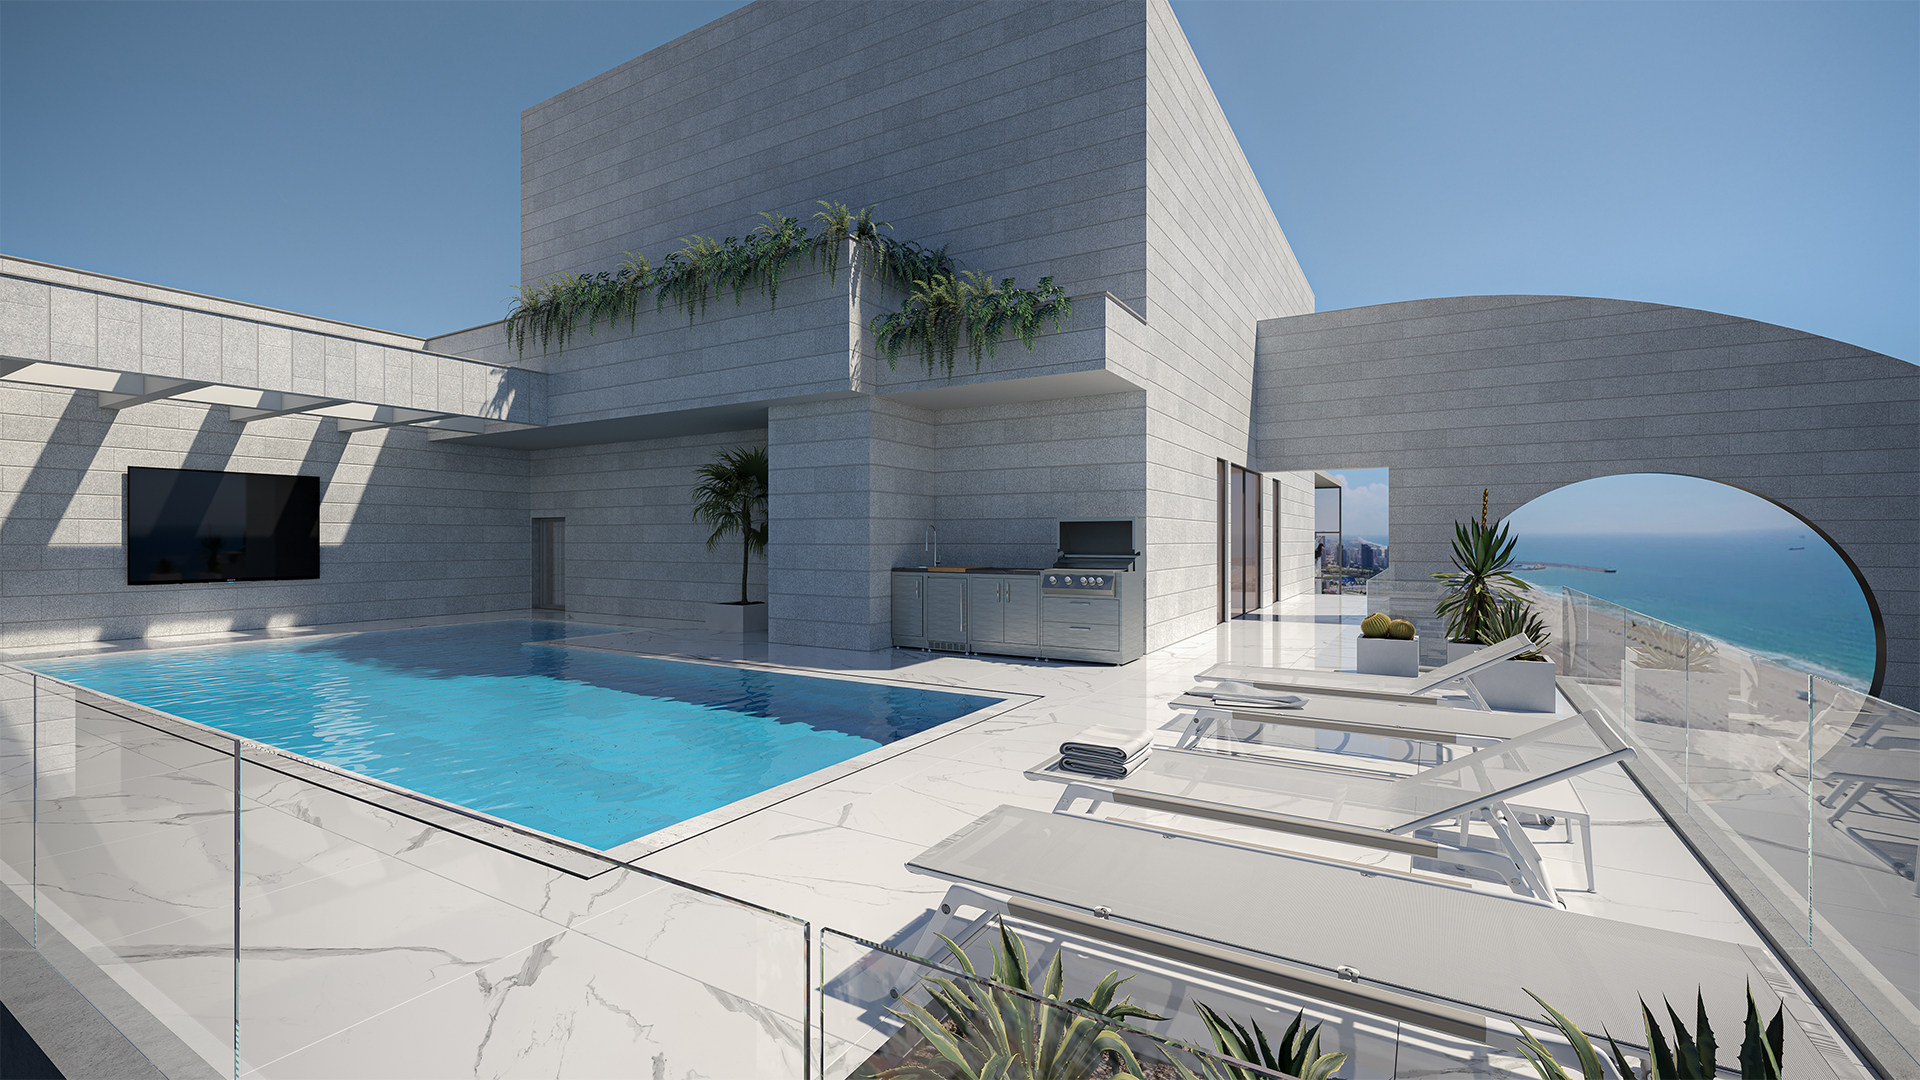 Maayan-Golan_Architectural-Visualization_interior-visualization_penthouse-apartment_balcony-pool_design-by-elad-ben-nahmias_06